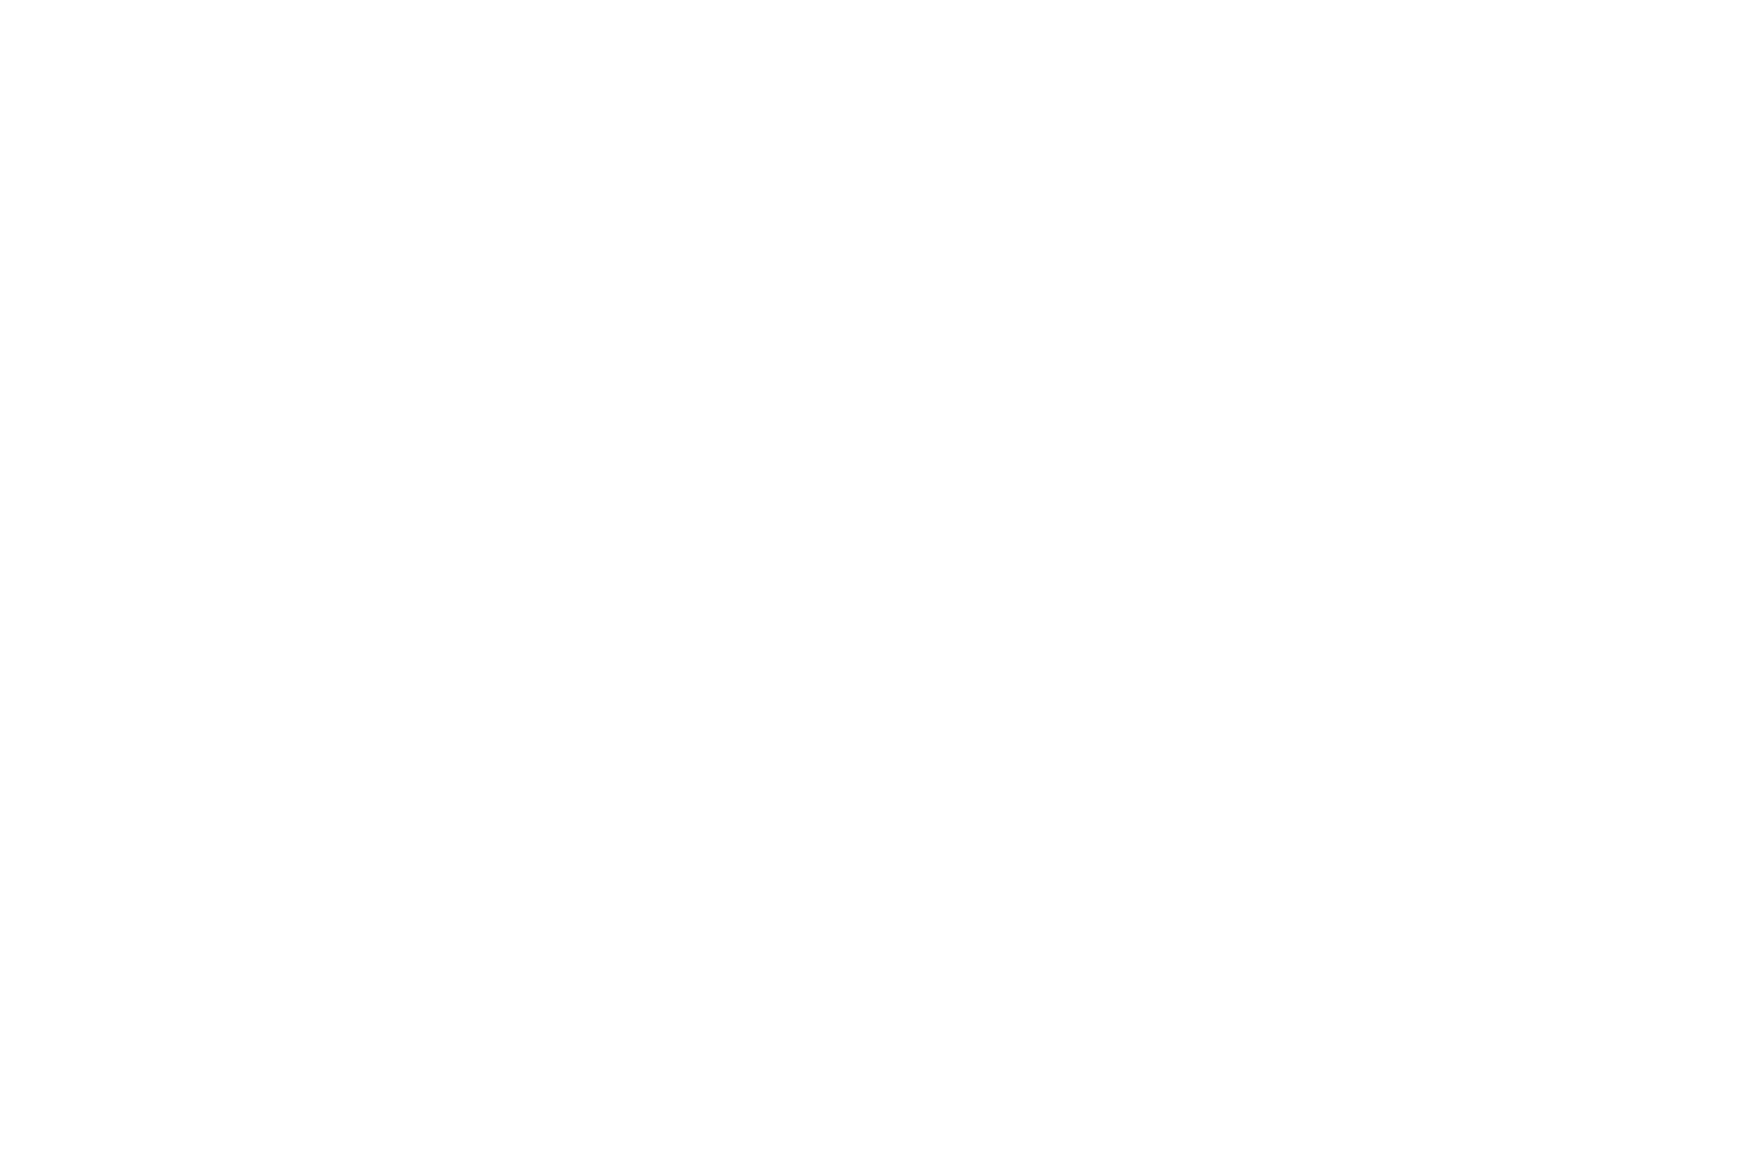 salopene